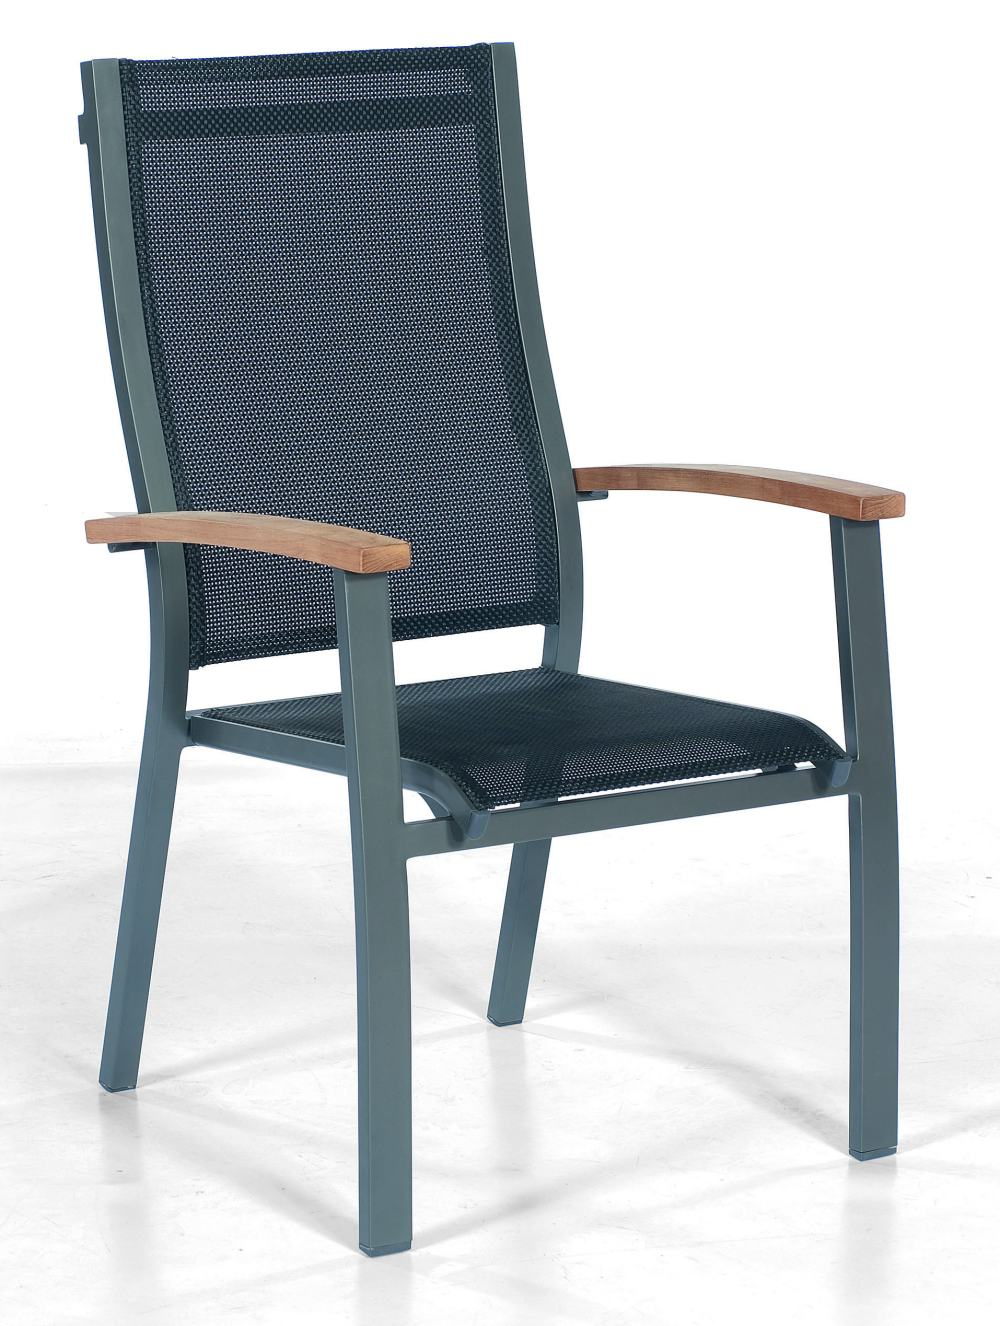 stapelbarer gartenstuhl aluminiumgestell anthrazit. Black Bedroom Furniture Sets. Home Design Ideas